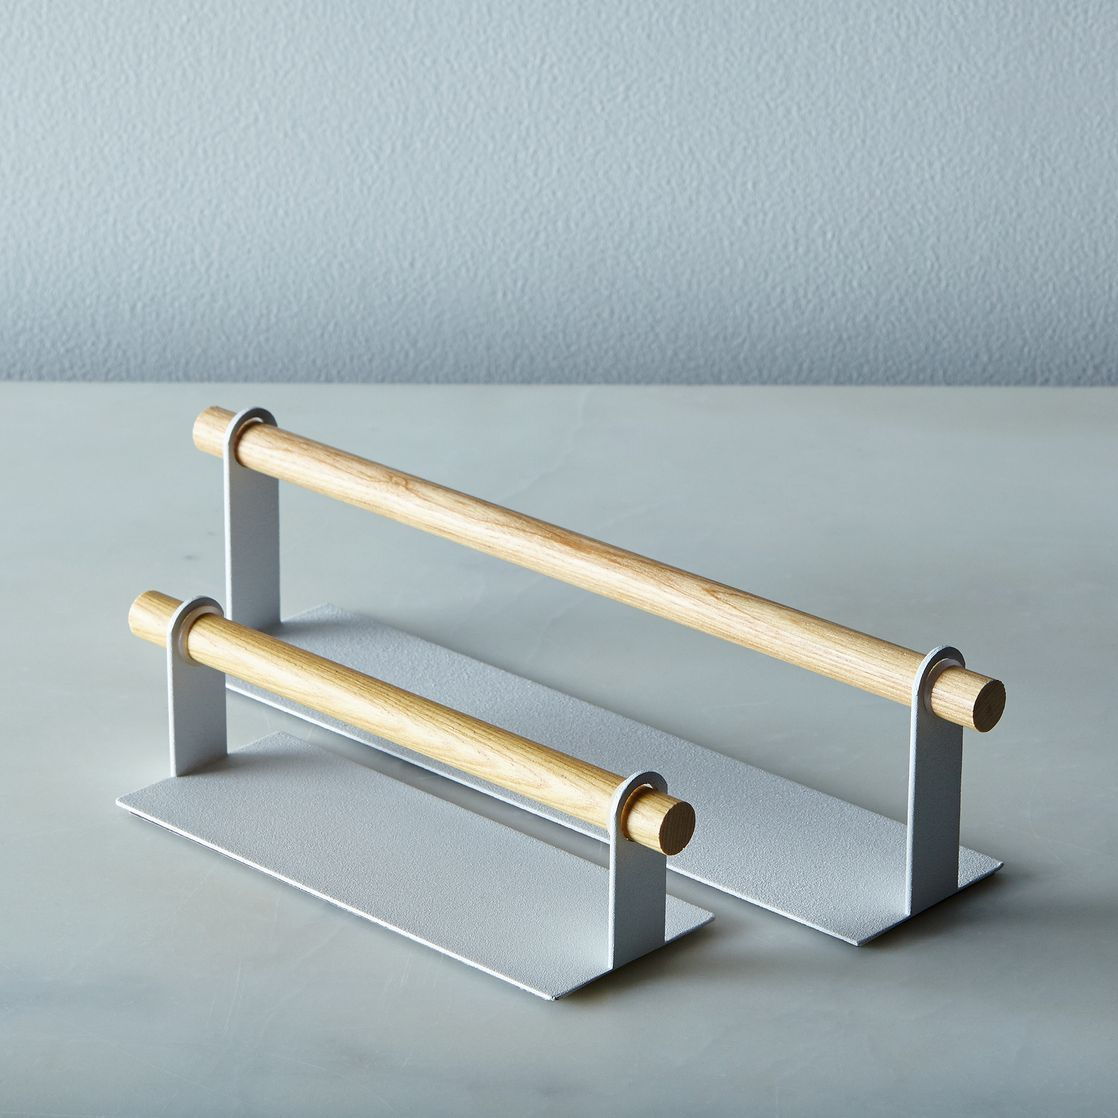 Magnetic Kitchen Towel Holder | INTERIOR DESIGN - My Loft ...